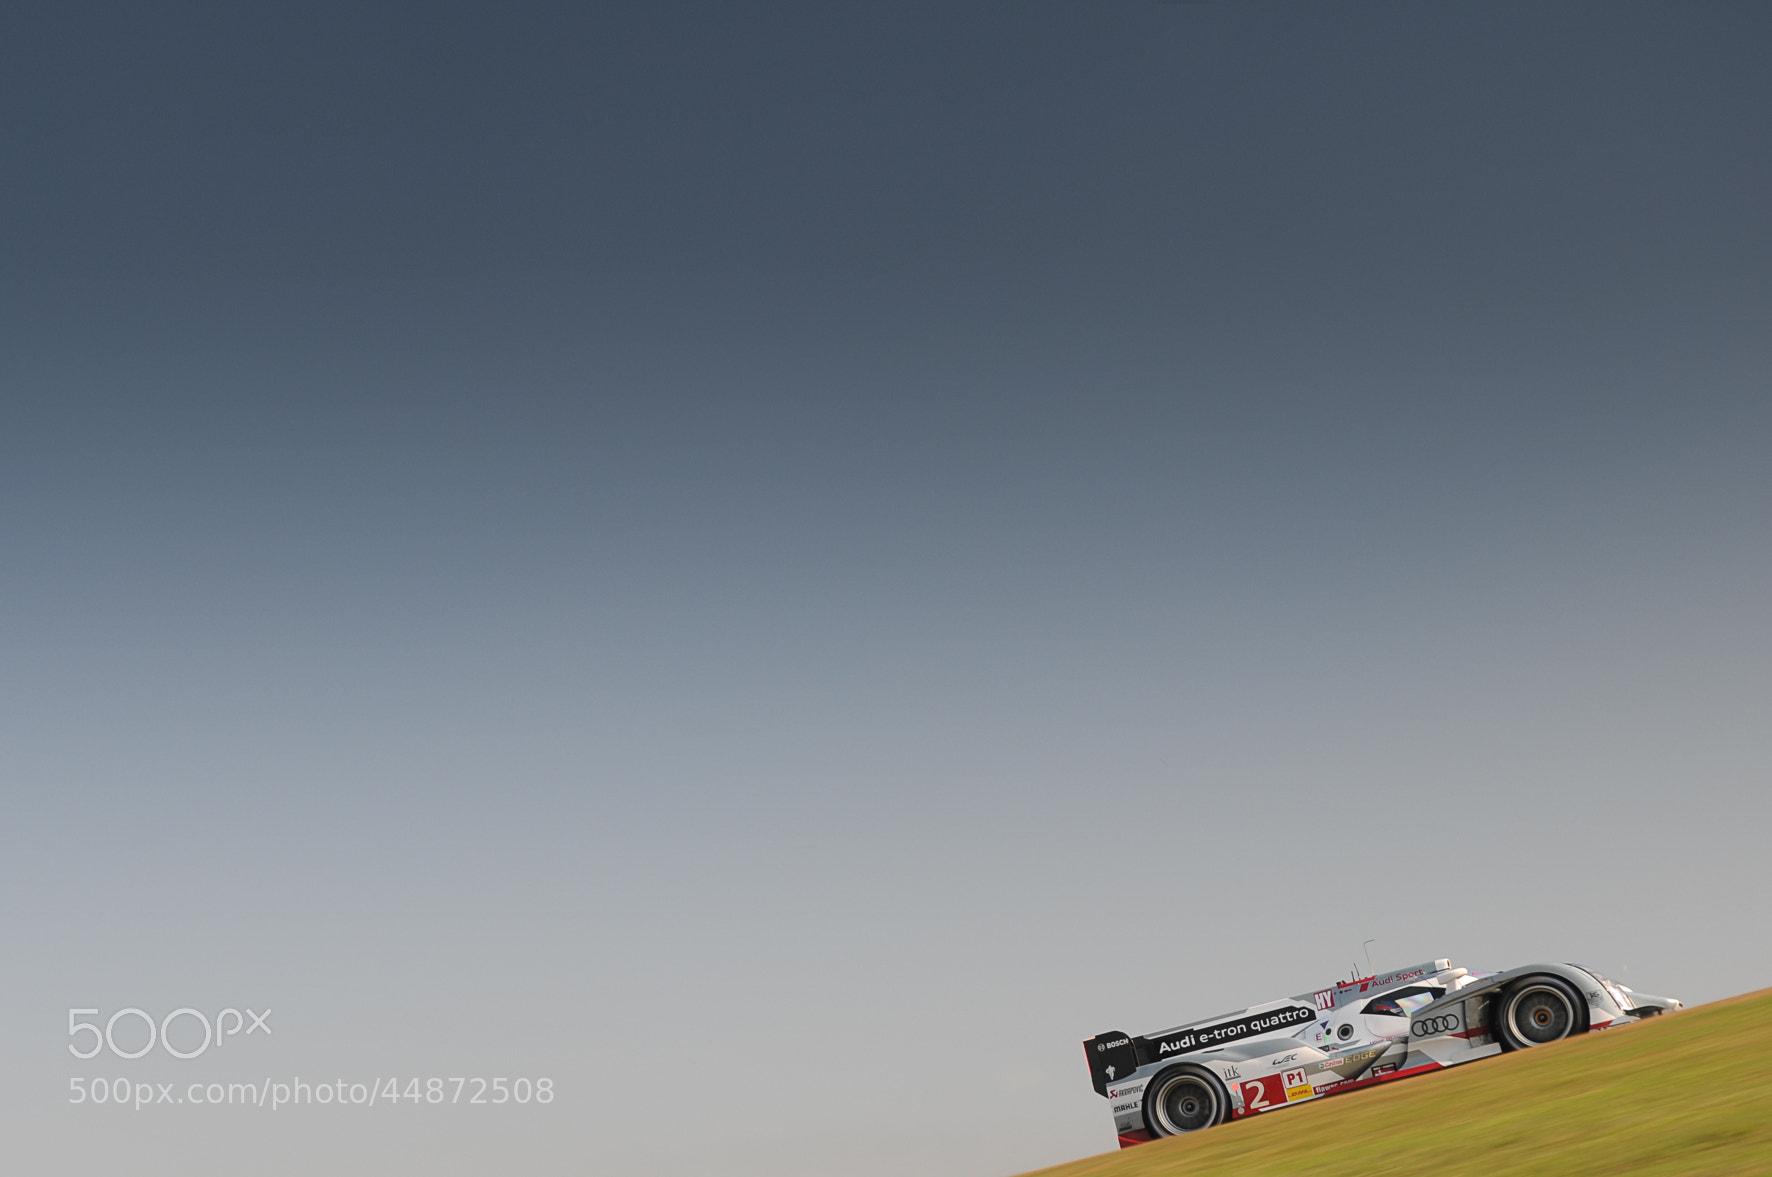 Photograph Audi - FIA WEC by Fabio Davini on 500px